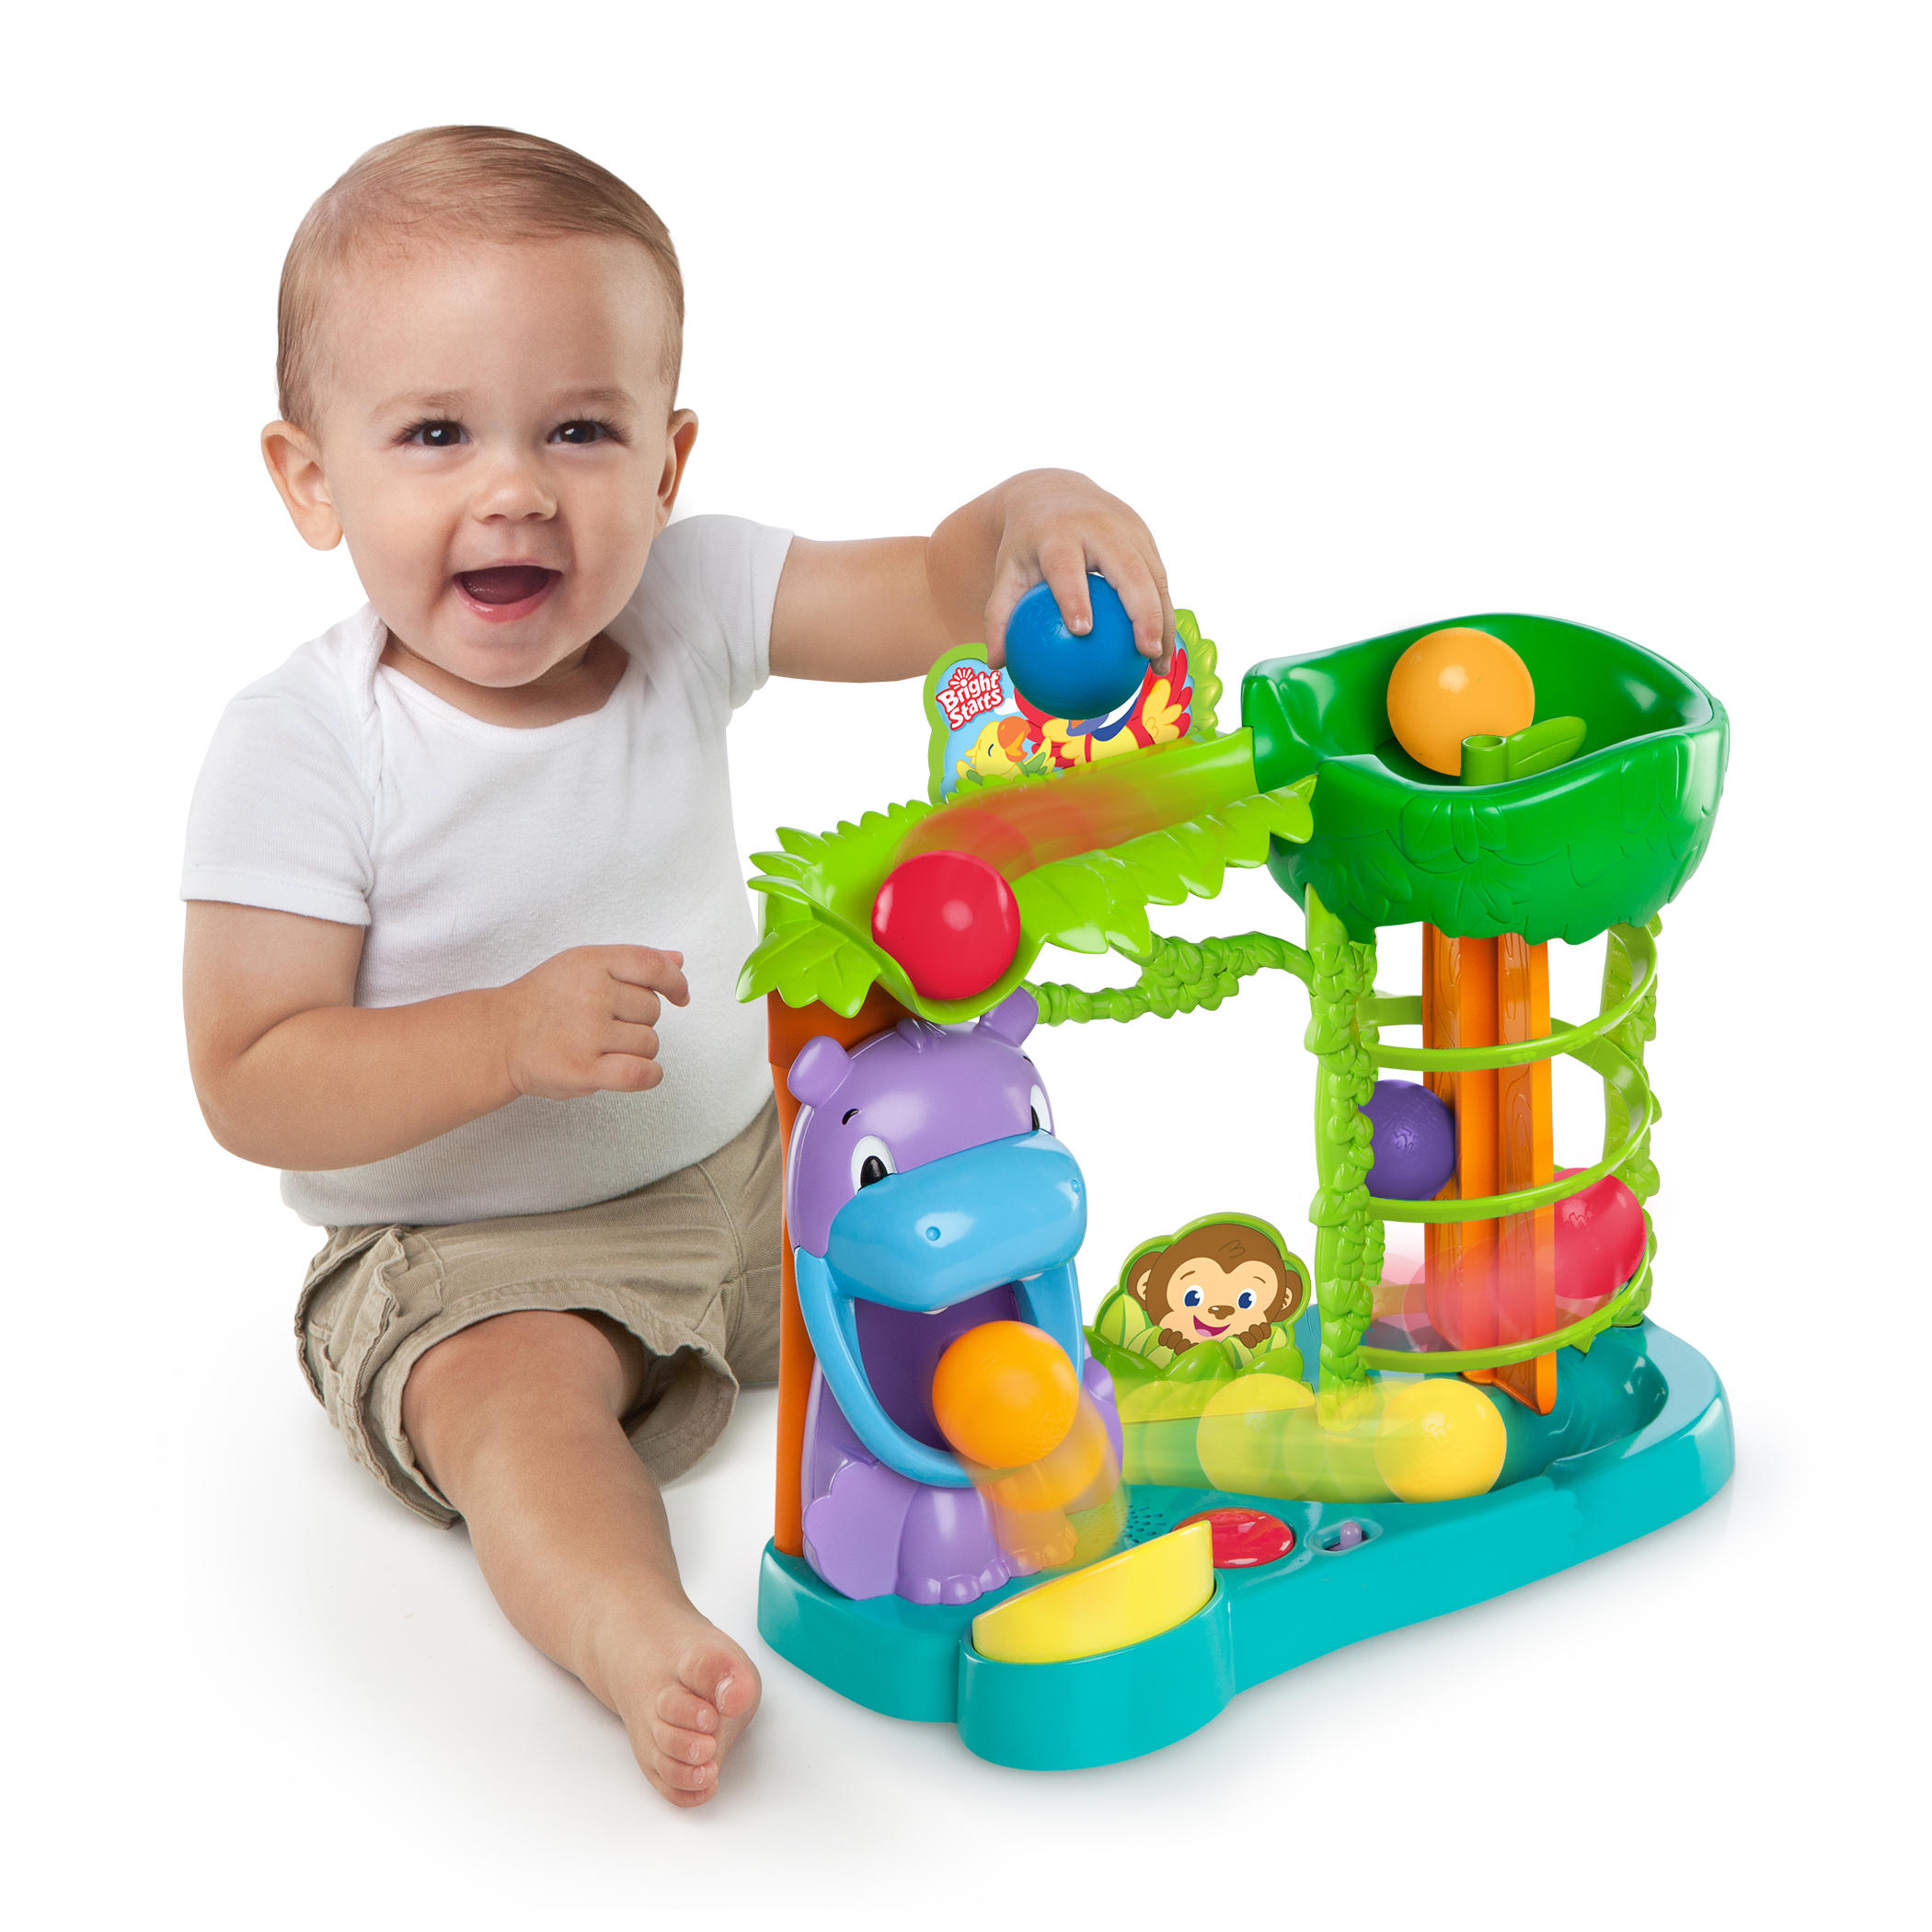 Jungle Fun Ball Climber™ Toy